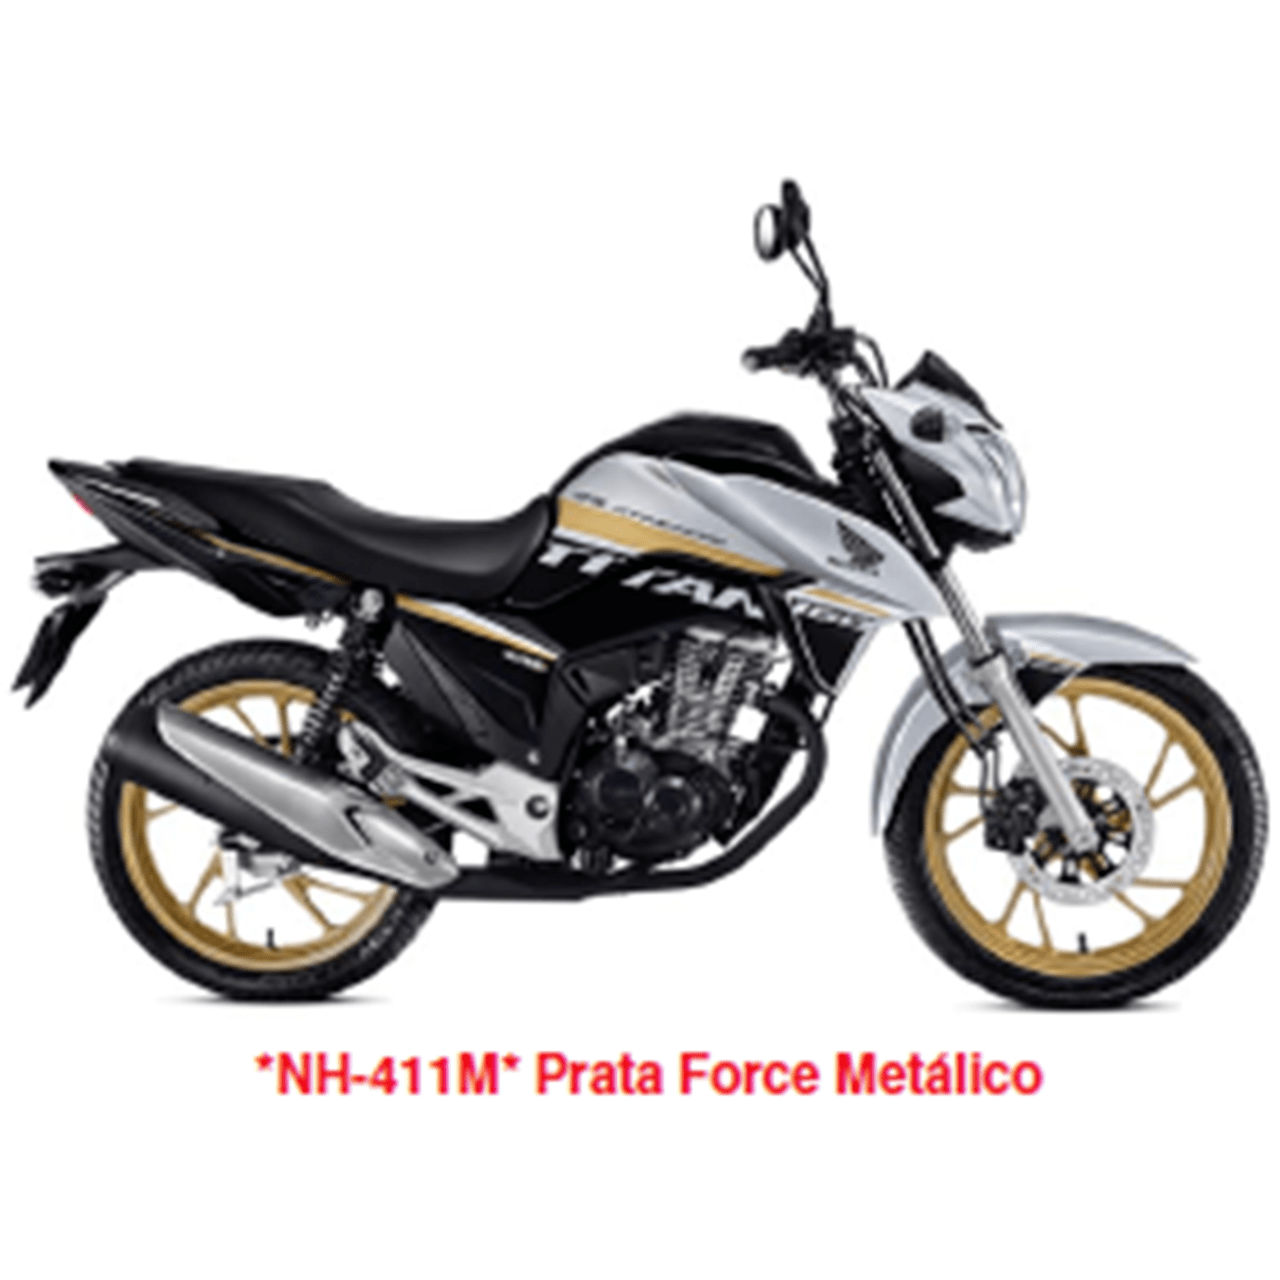 Carenagem Esquerda Tanque CG TITAN 160 EX 2019 Original Honda 64300KVSN40ZA